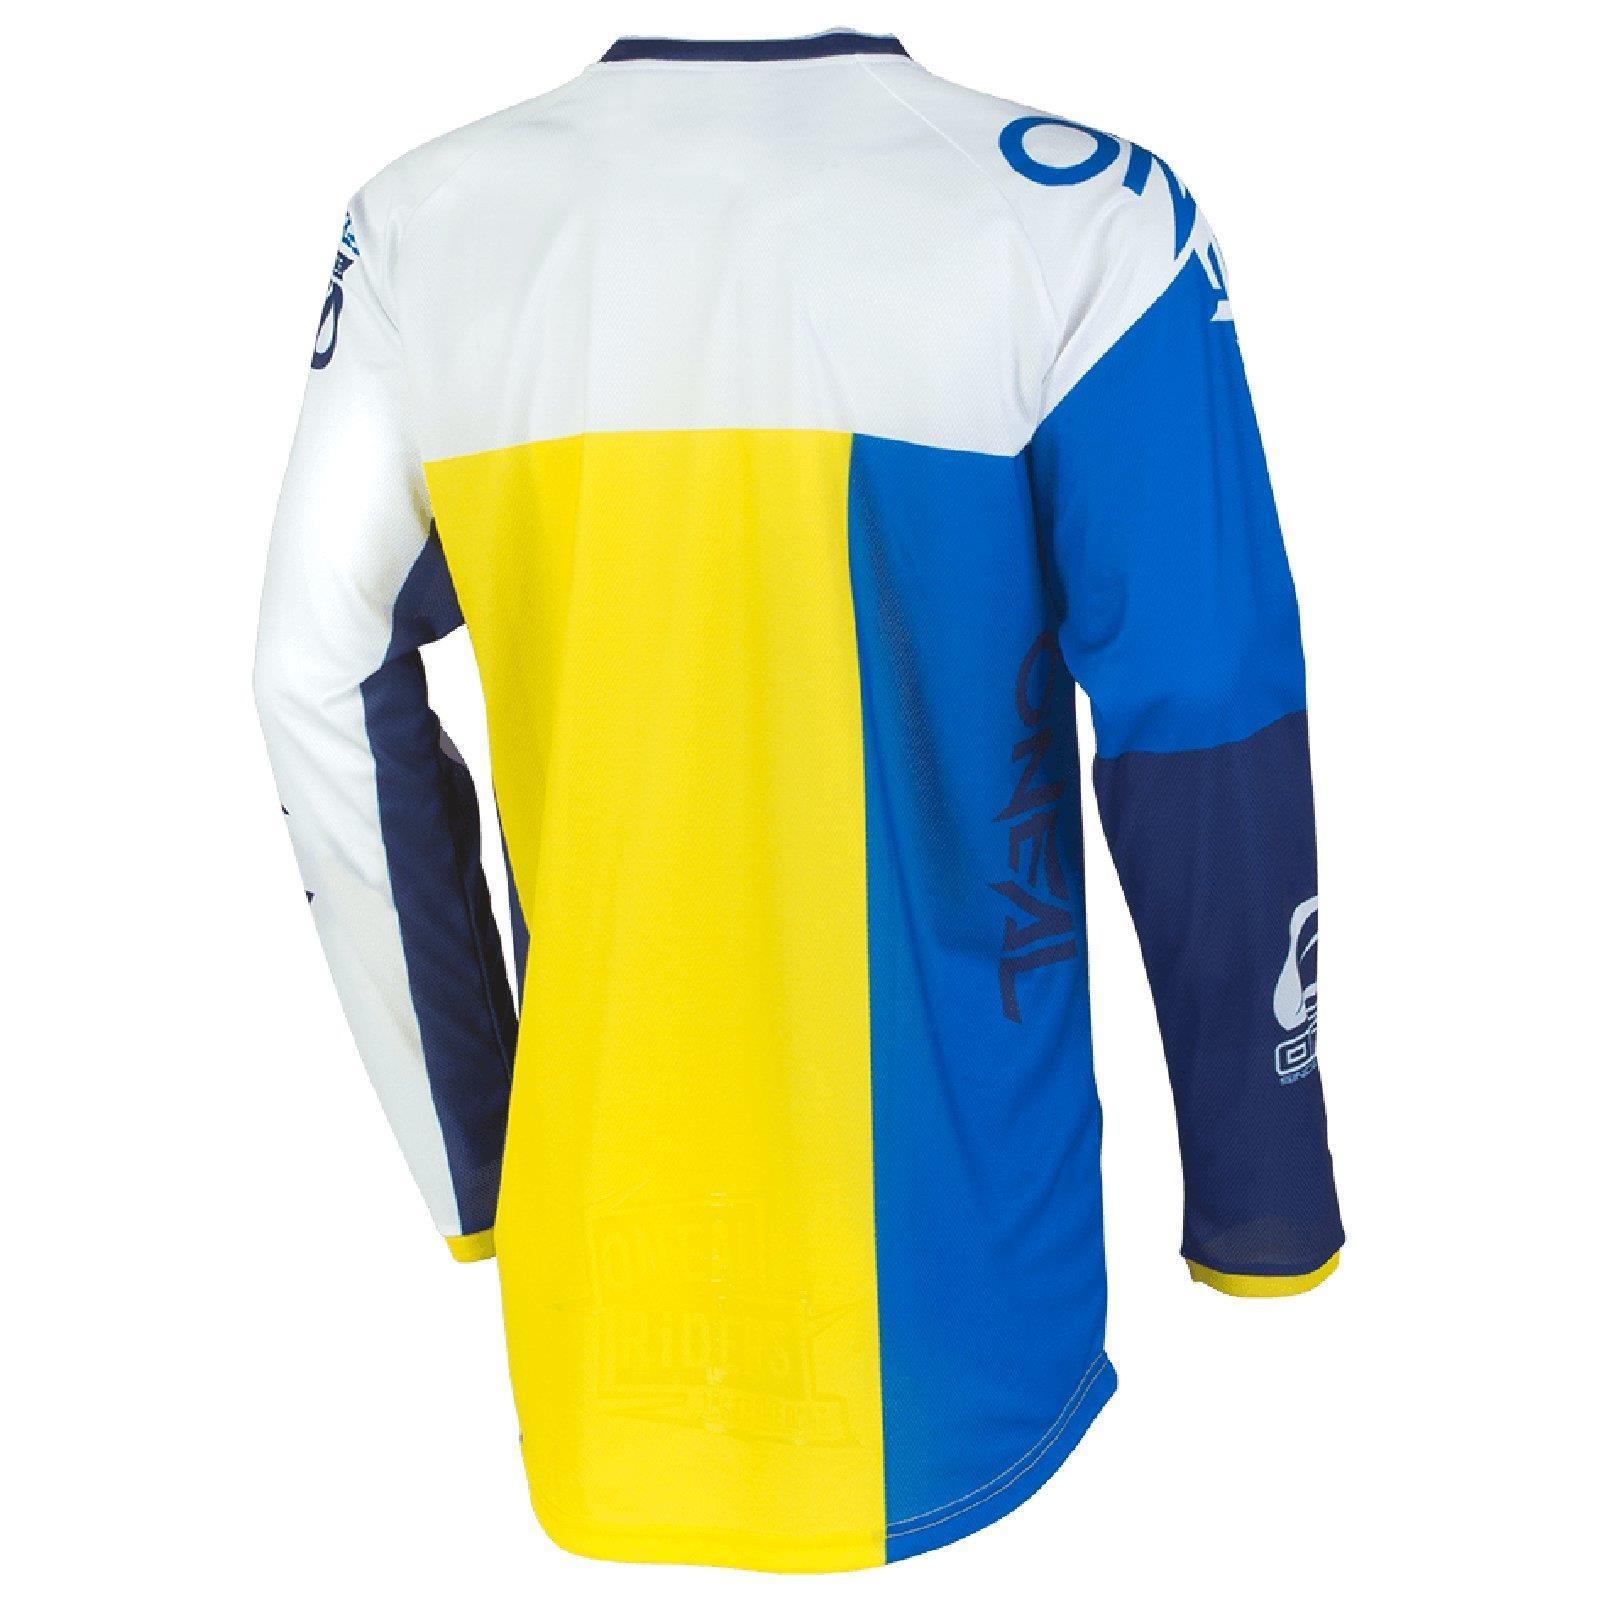 O-039-Neal-elemento-Mayhem-JERSEY-Racewear-Motocross-Maglia-MX-DH-FR-MTB-MOUNTAIN-BIKE miniatura 94